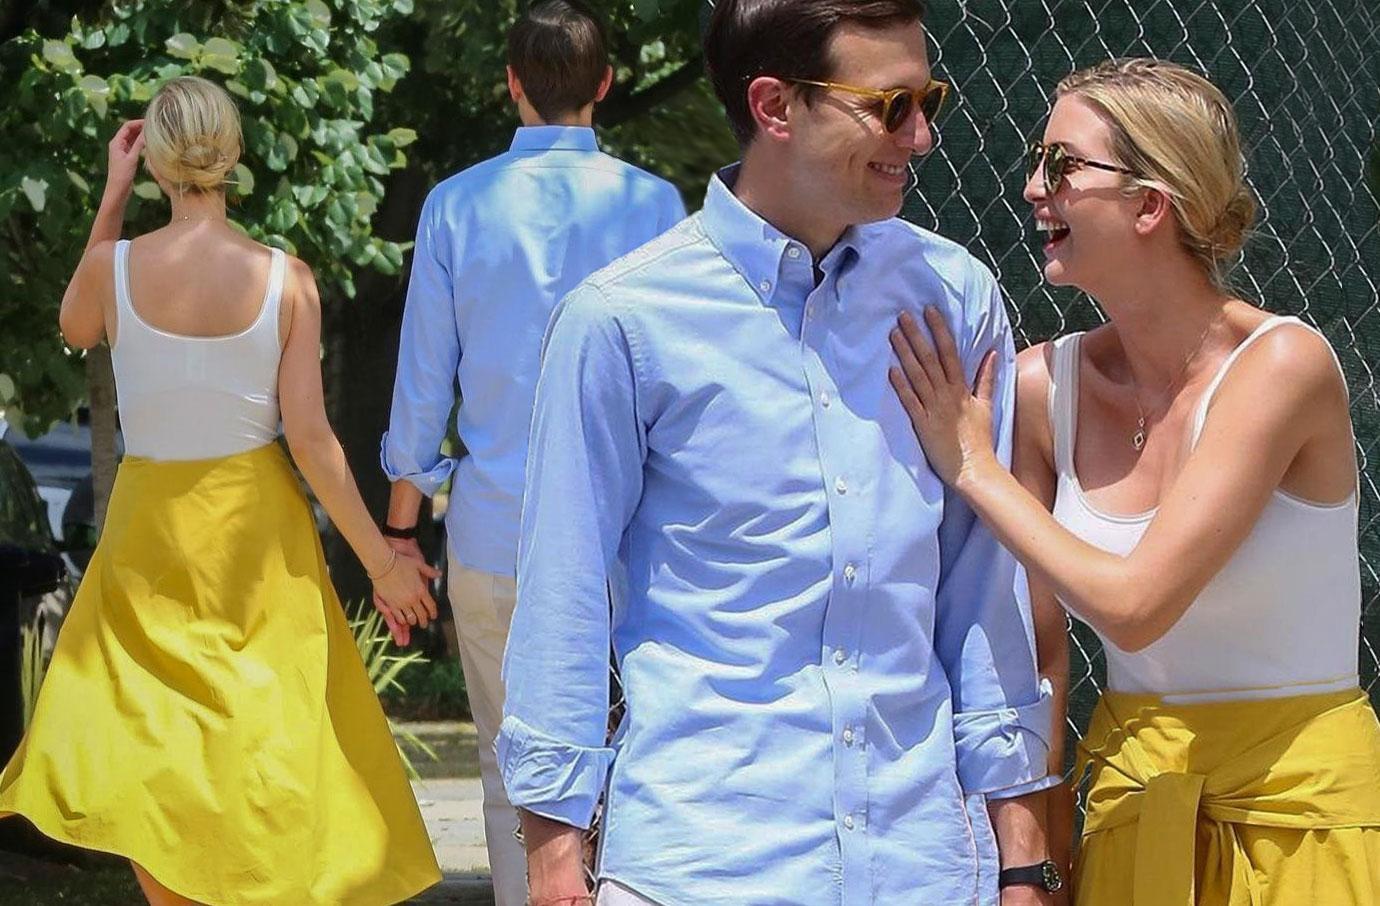 Ivanka Trump Shares Romantic Walk With Husband Jared Kushner